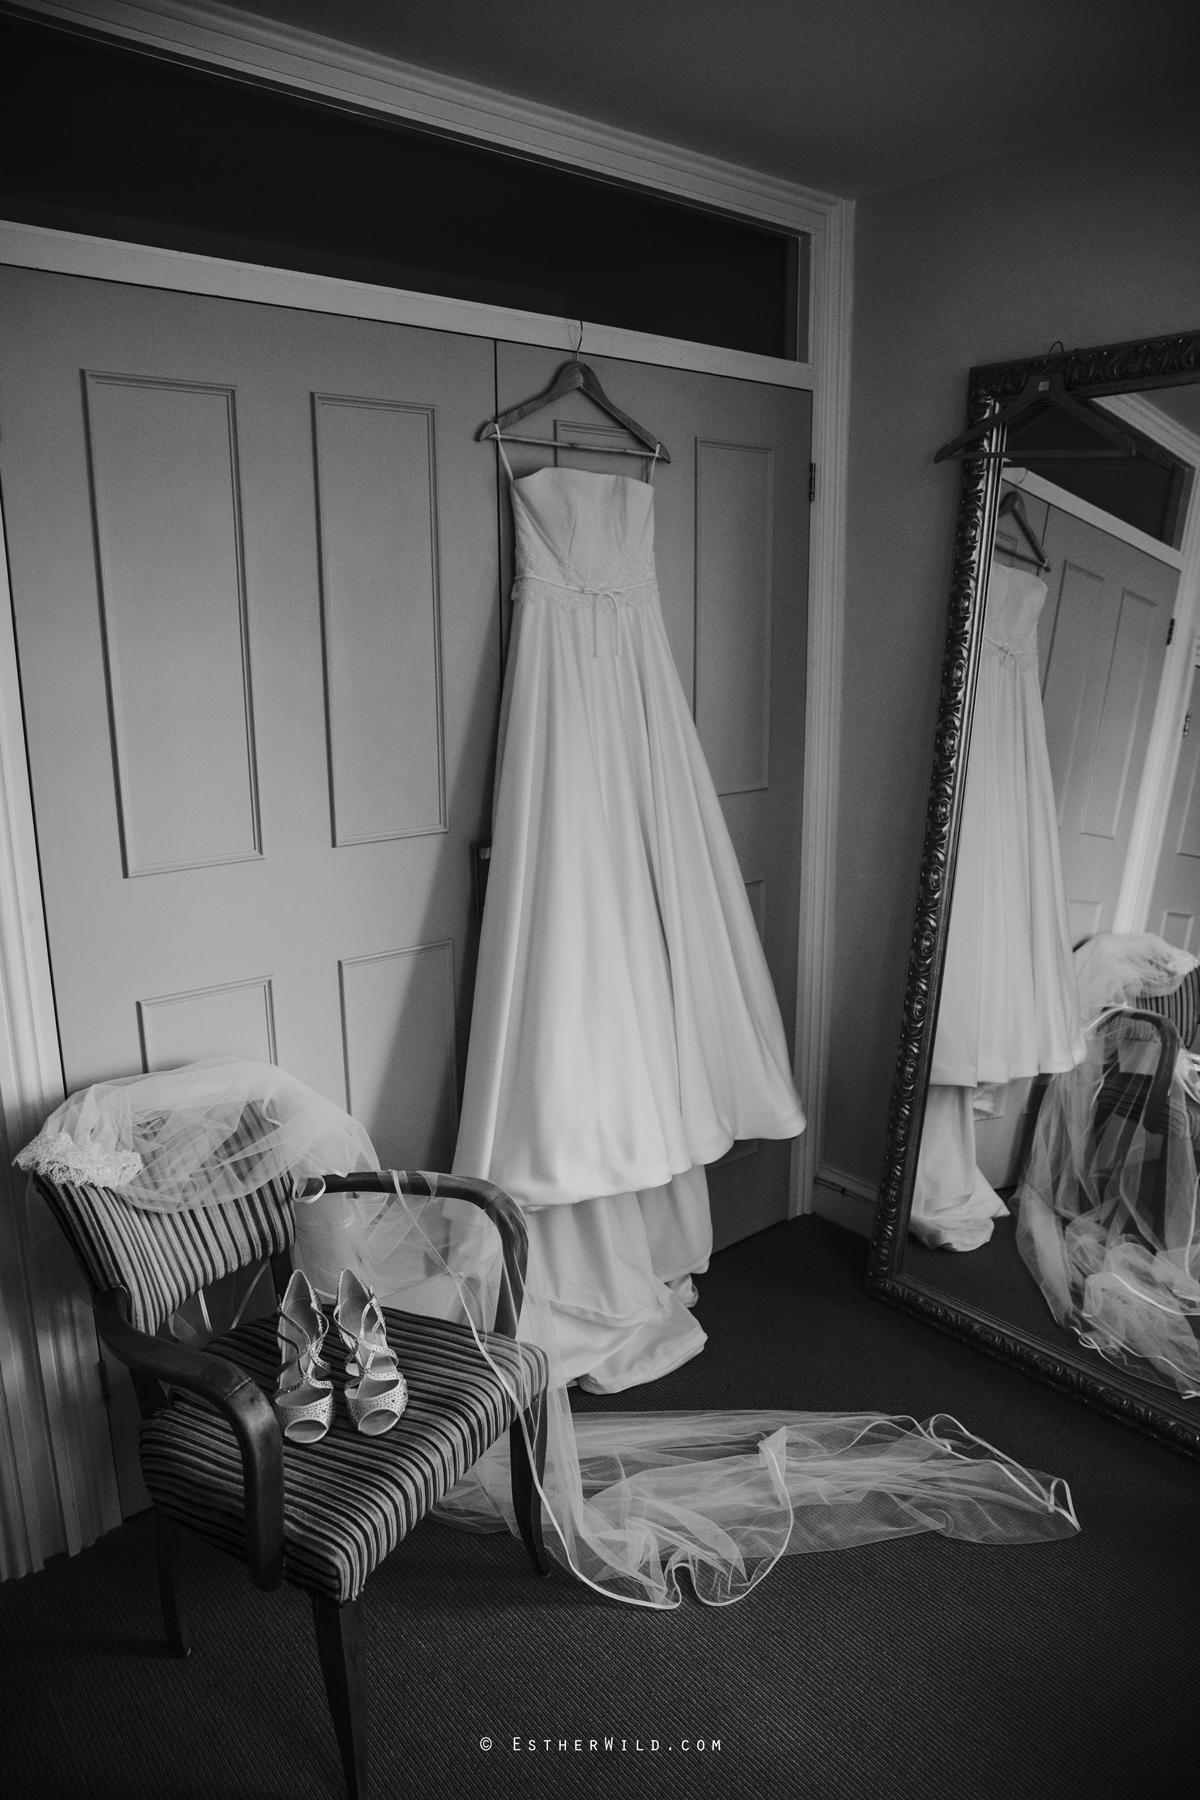 The_BoatHouse_Wedding_Venue_Ormesby_Norfolk_Broads_Boat_Wedding_Photography_Esther_Wild_Photographer_IMG_0051-2.jpg